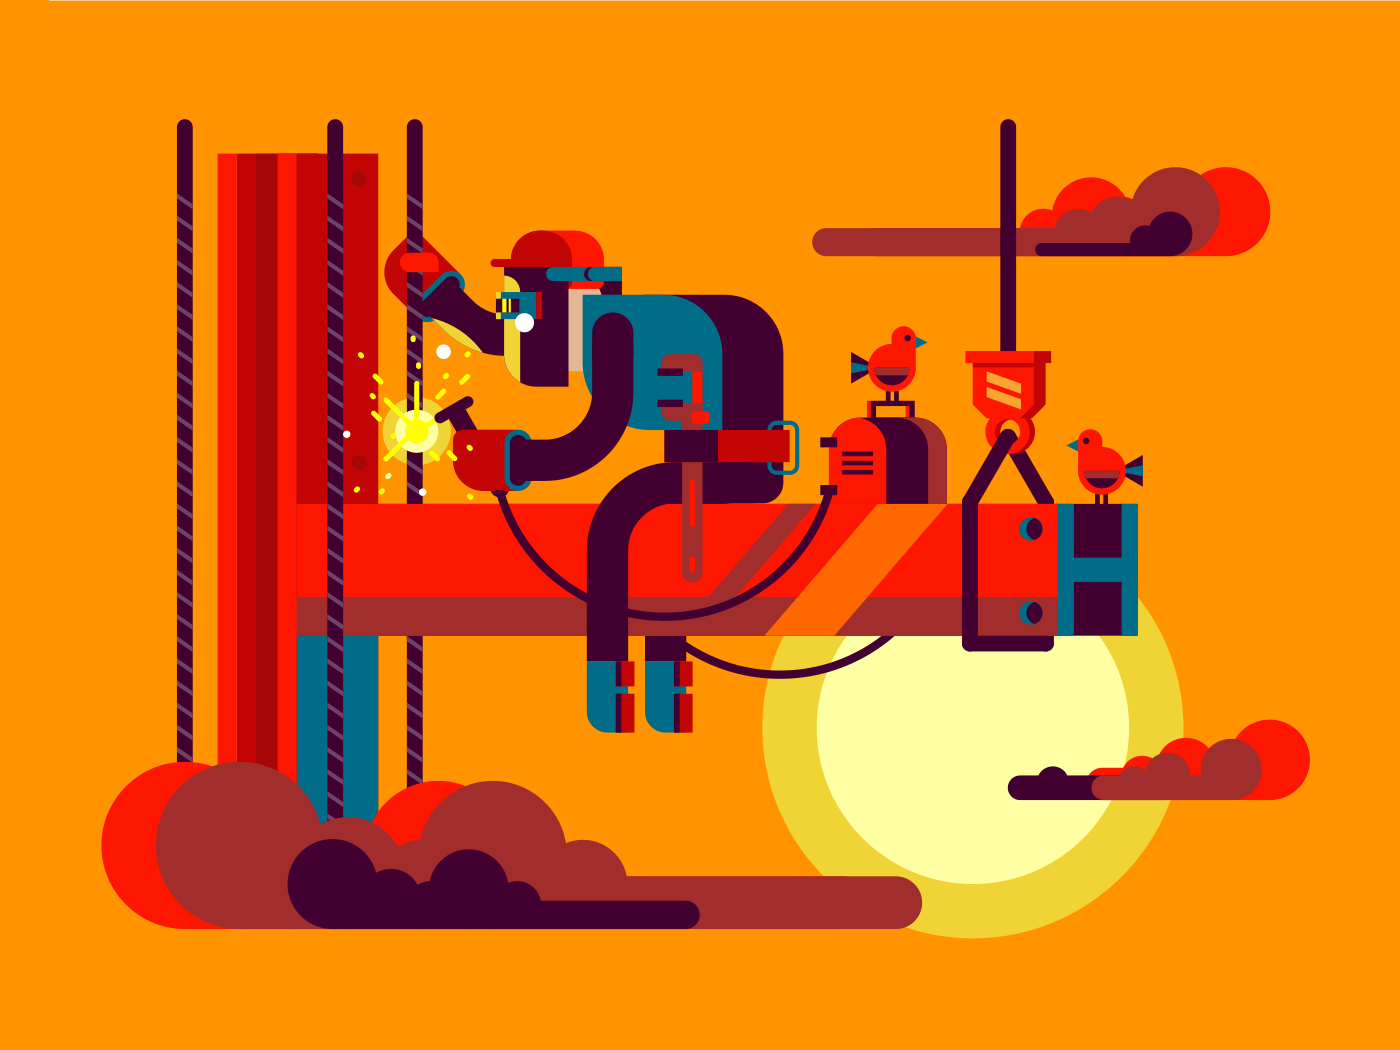 Welder climber flat vector illustration